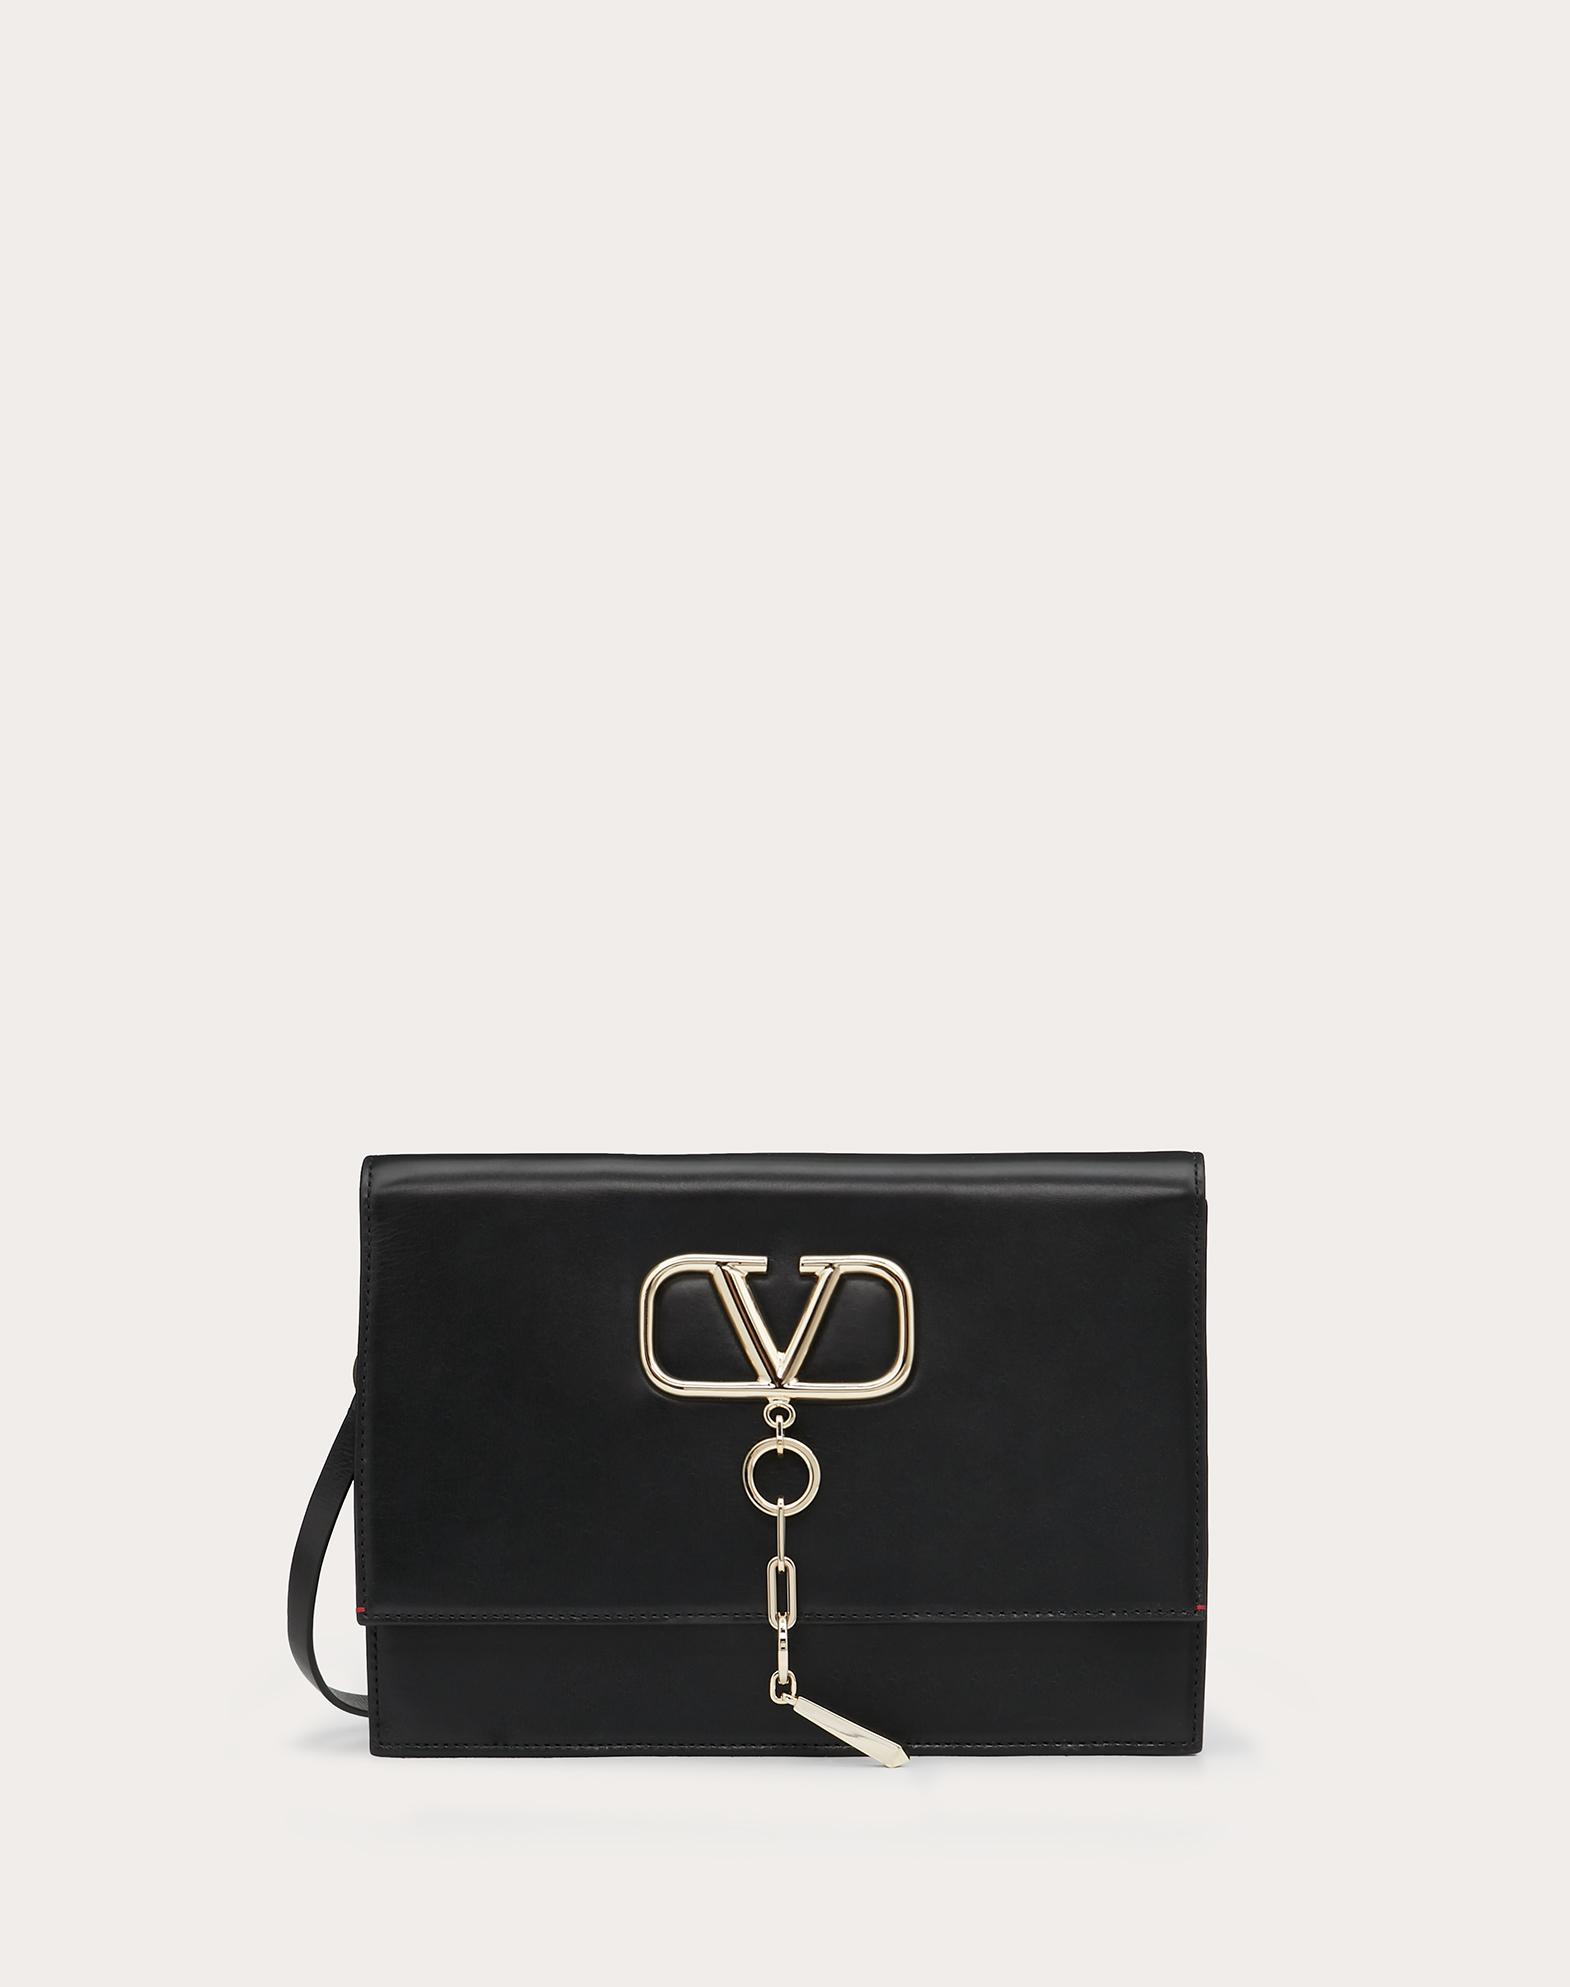 VCASE Smooth Calfskin Crossbody Bag